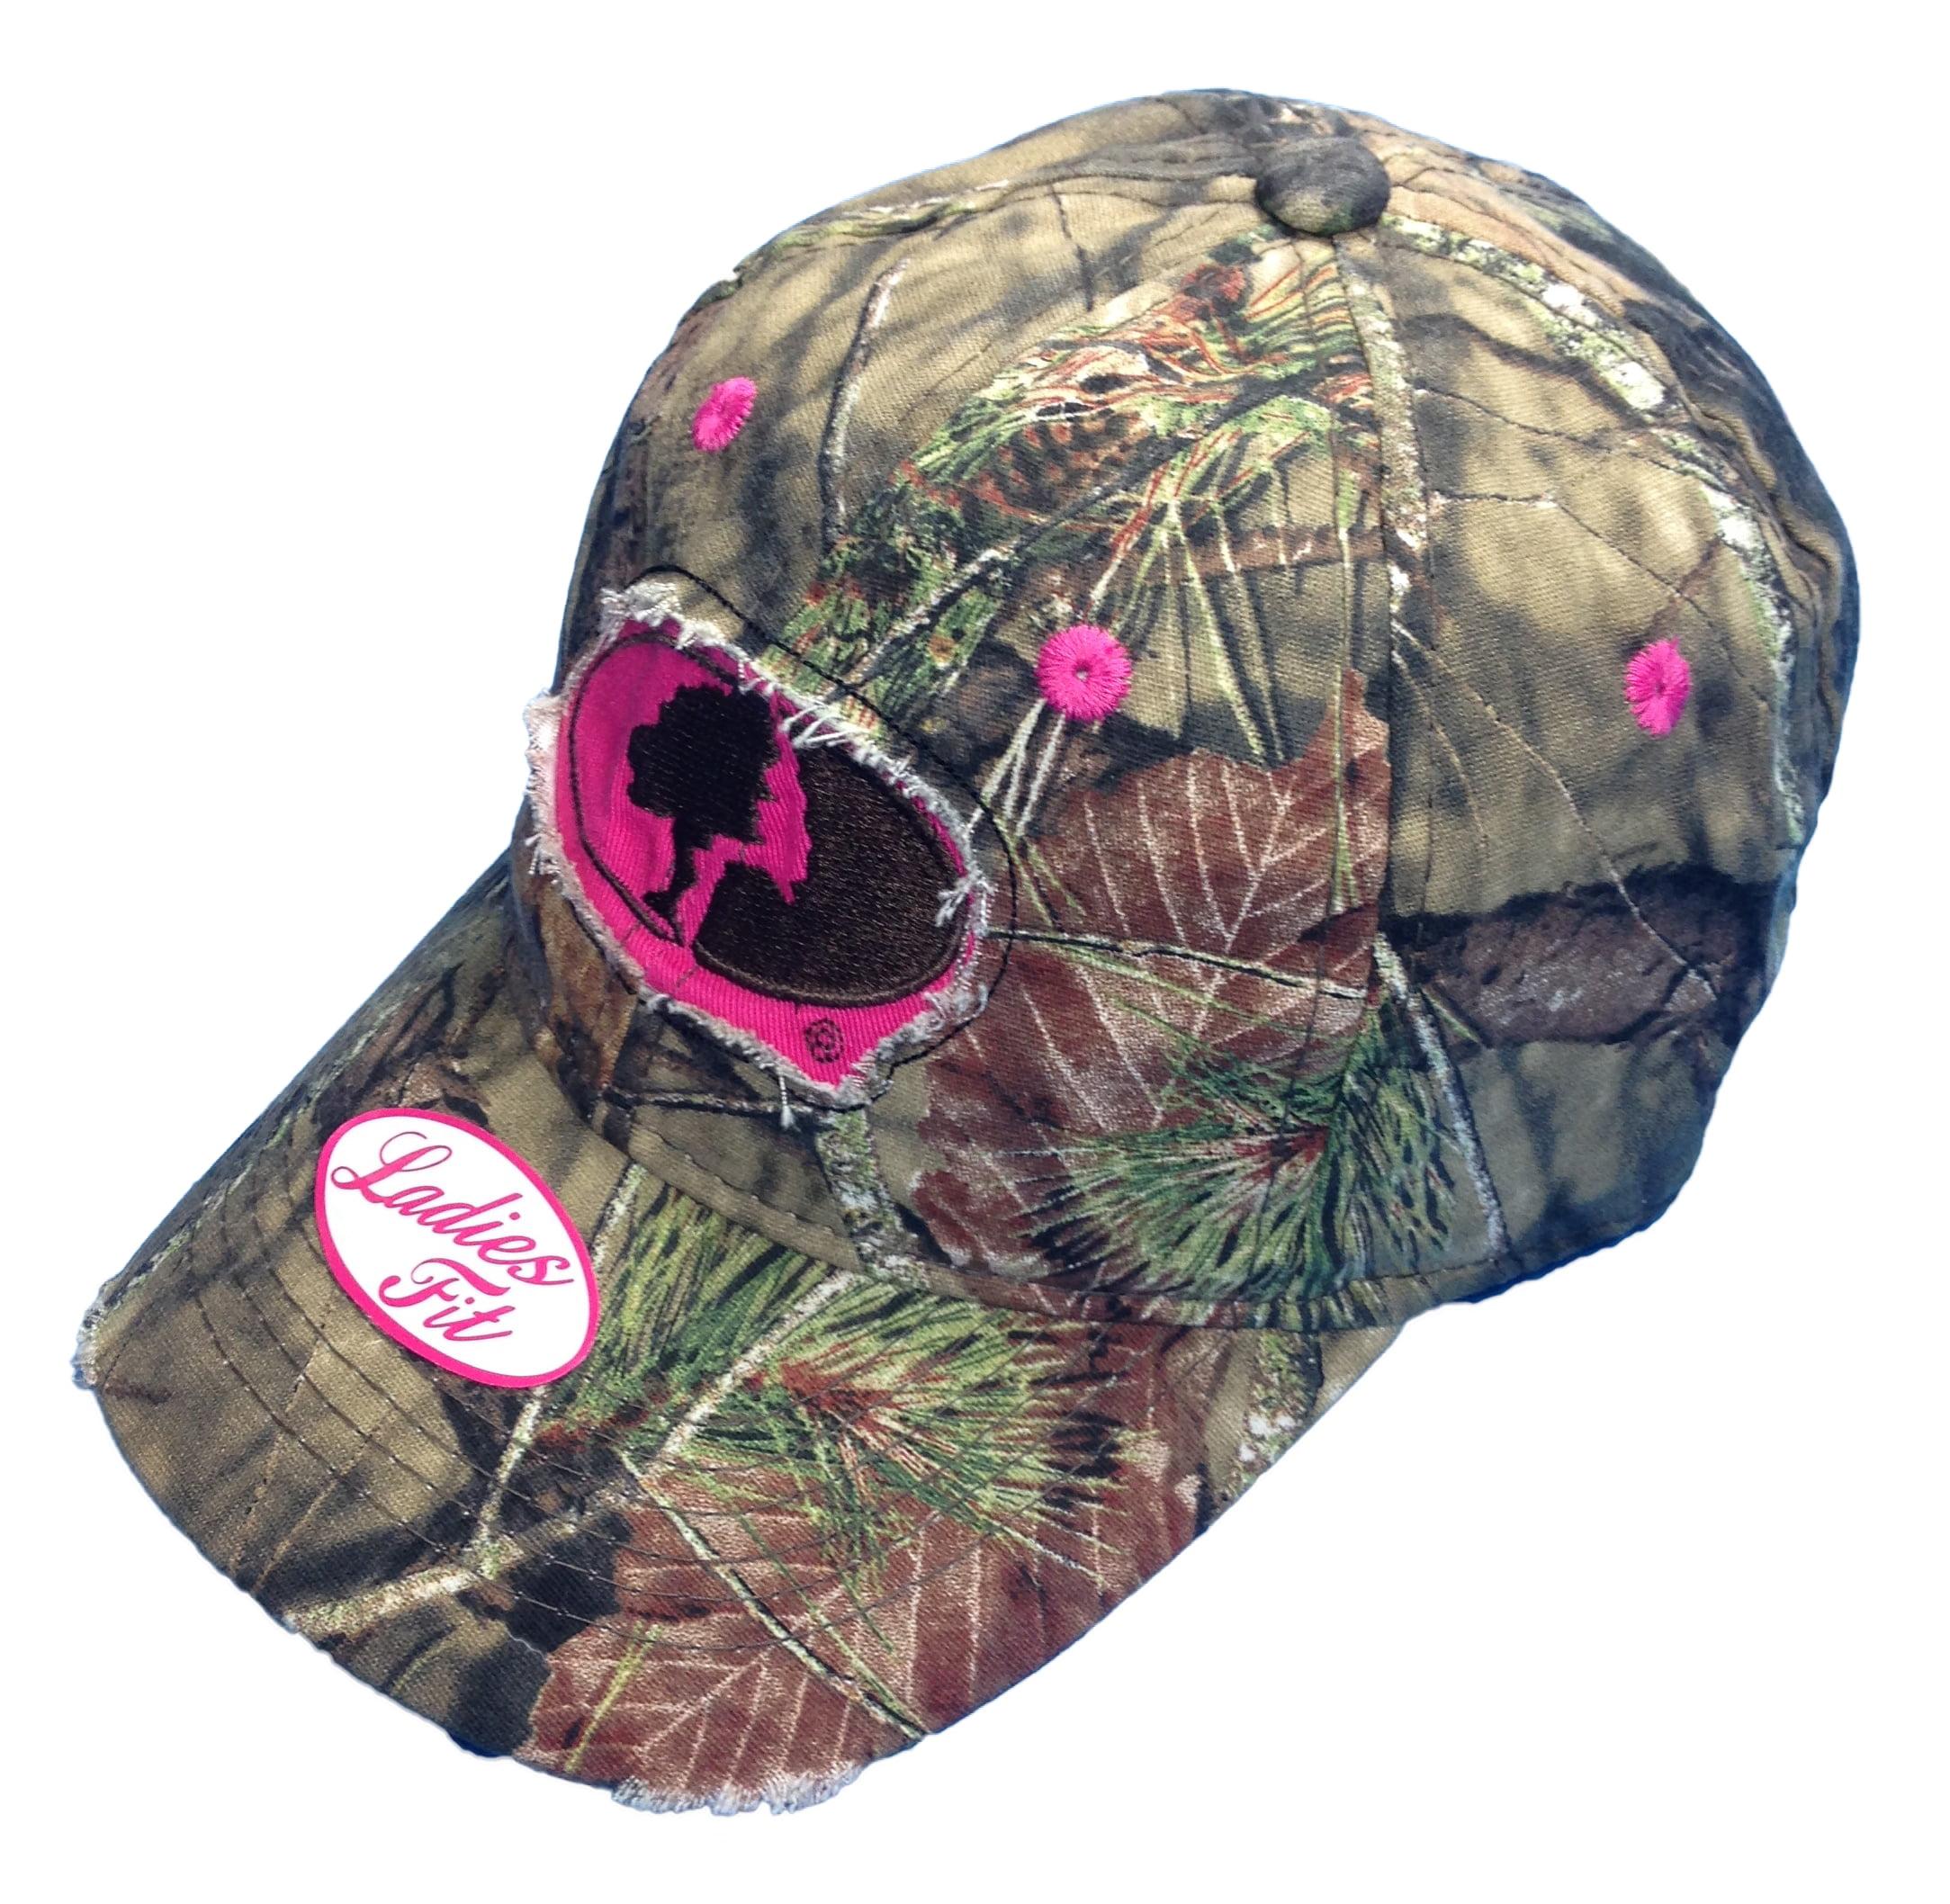 BT Outdoors Camo Cutie Cap,Mossy Oak Camo Cap with pink Trim and logo